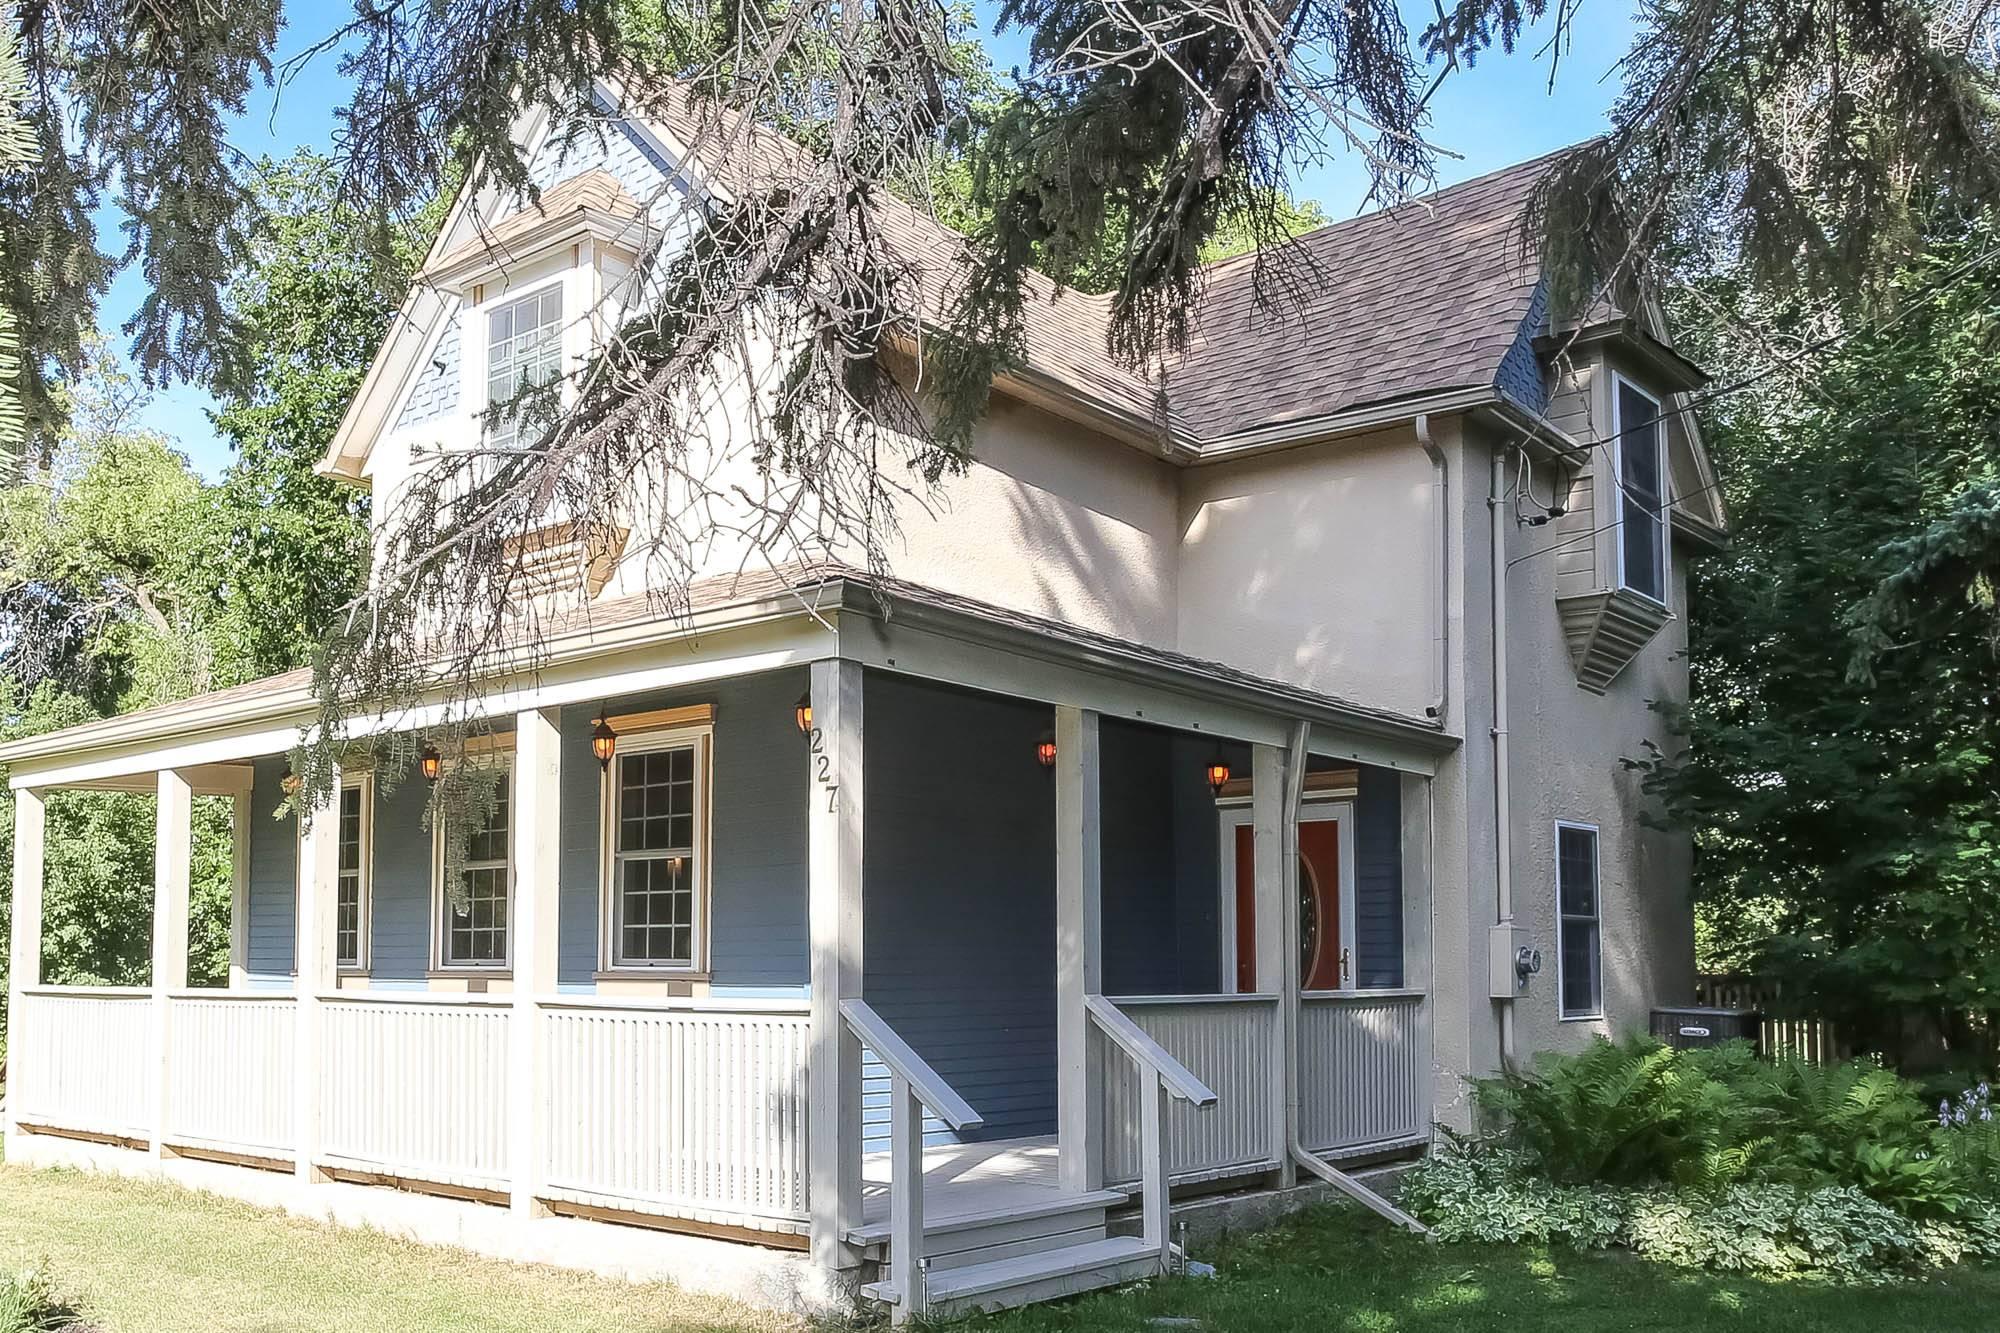 227 Eveline St, Winnipeg, Manitoba  R1A 1L7 - Photo 28 - 1921766